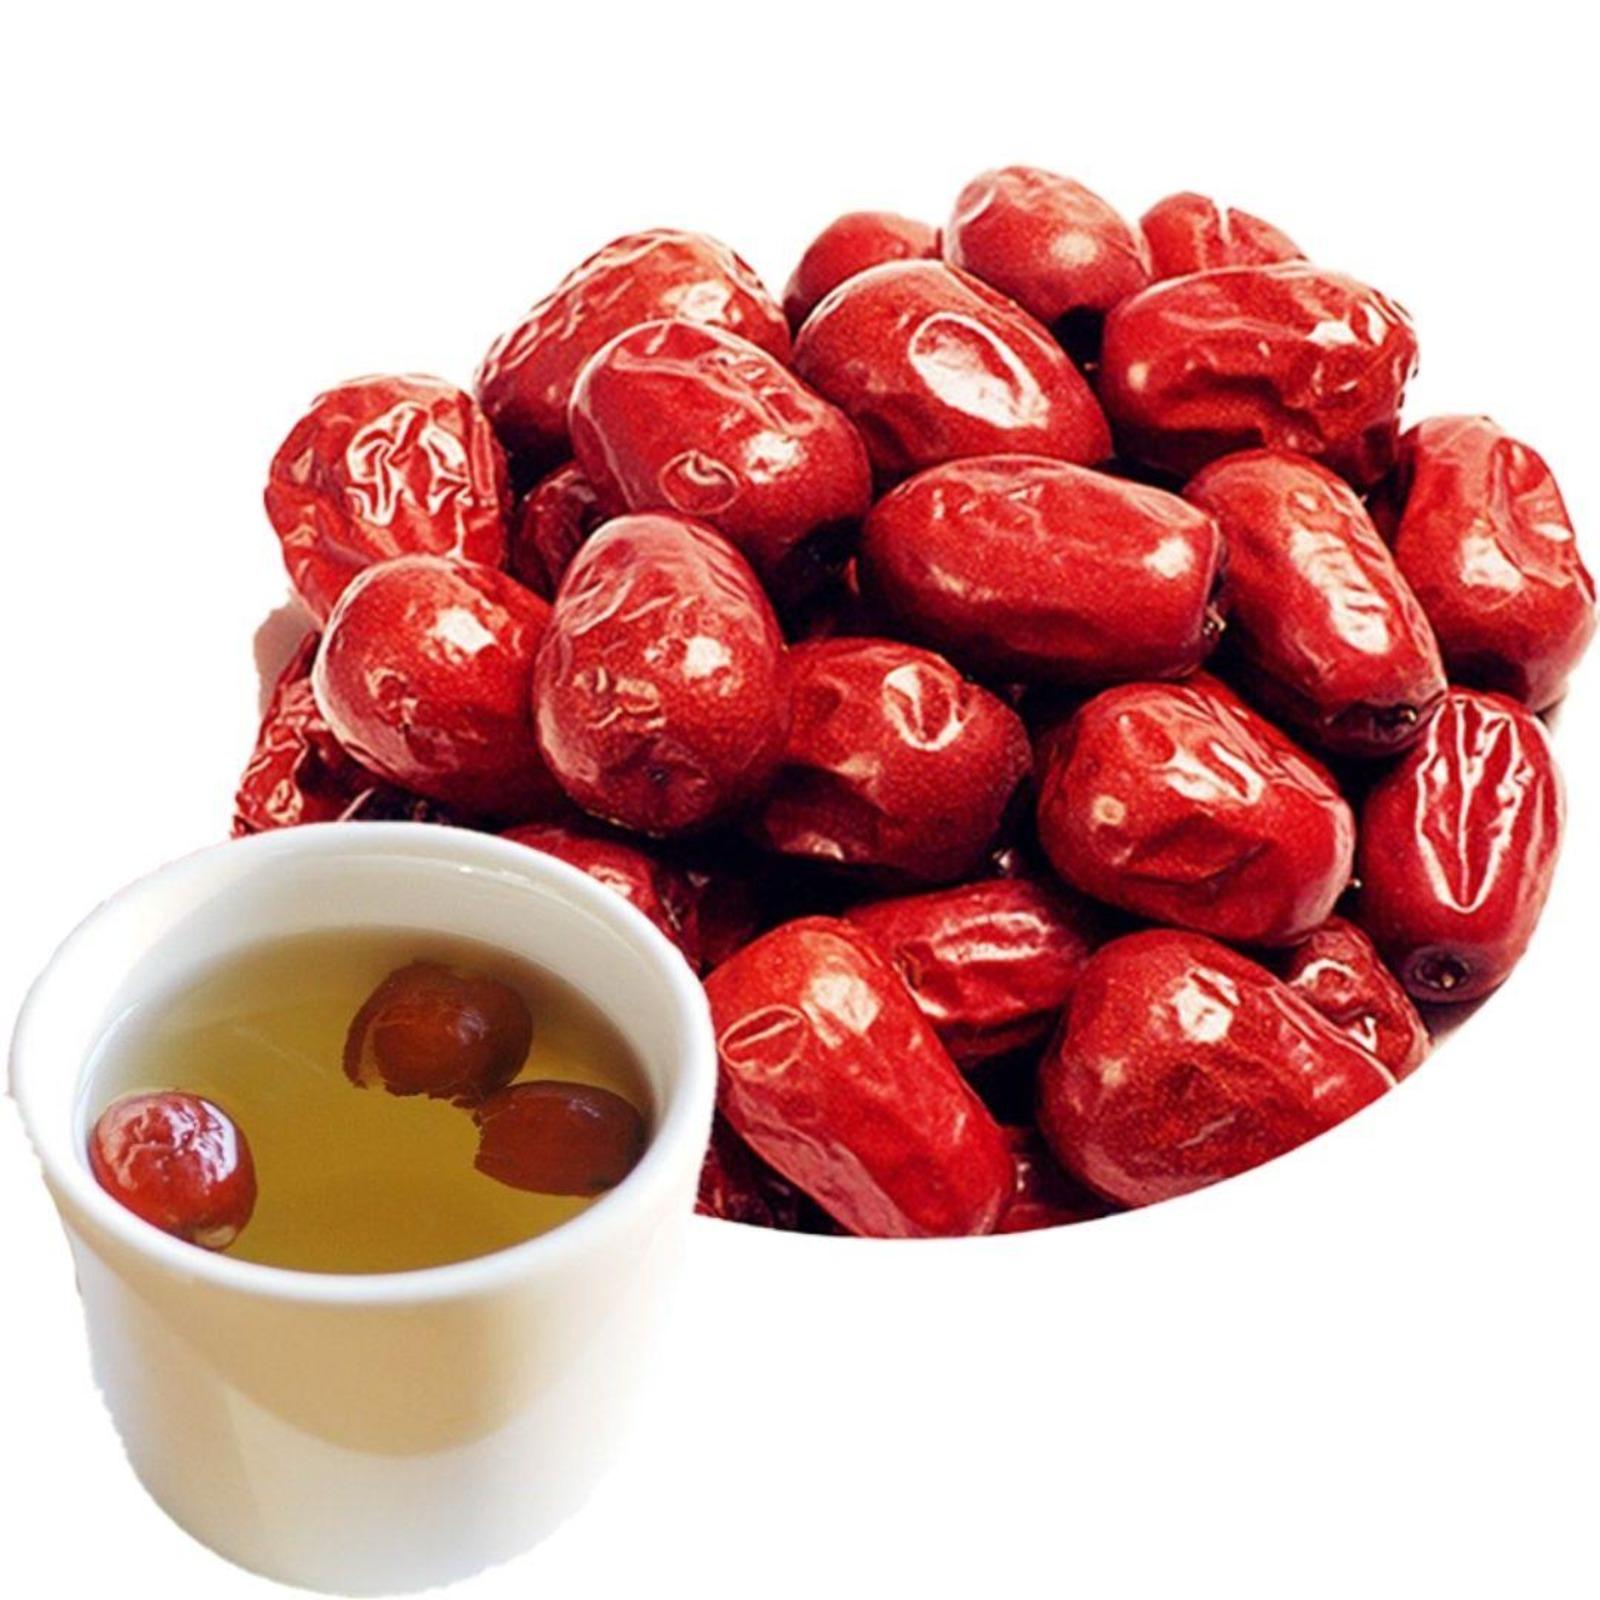 Gin Thye Red Dates Seedless (medium)